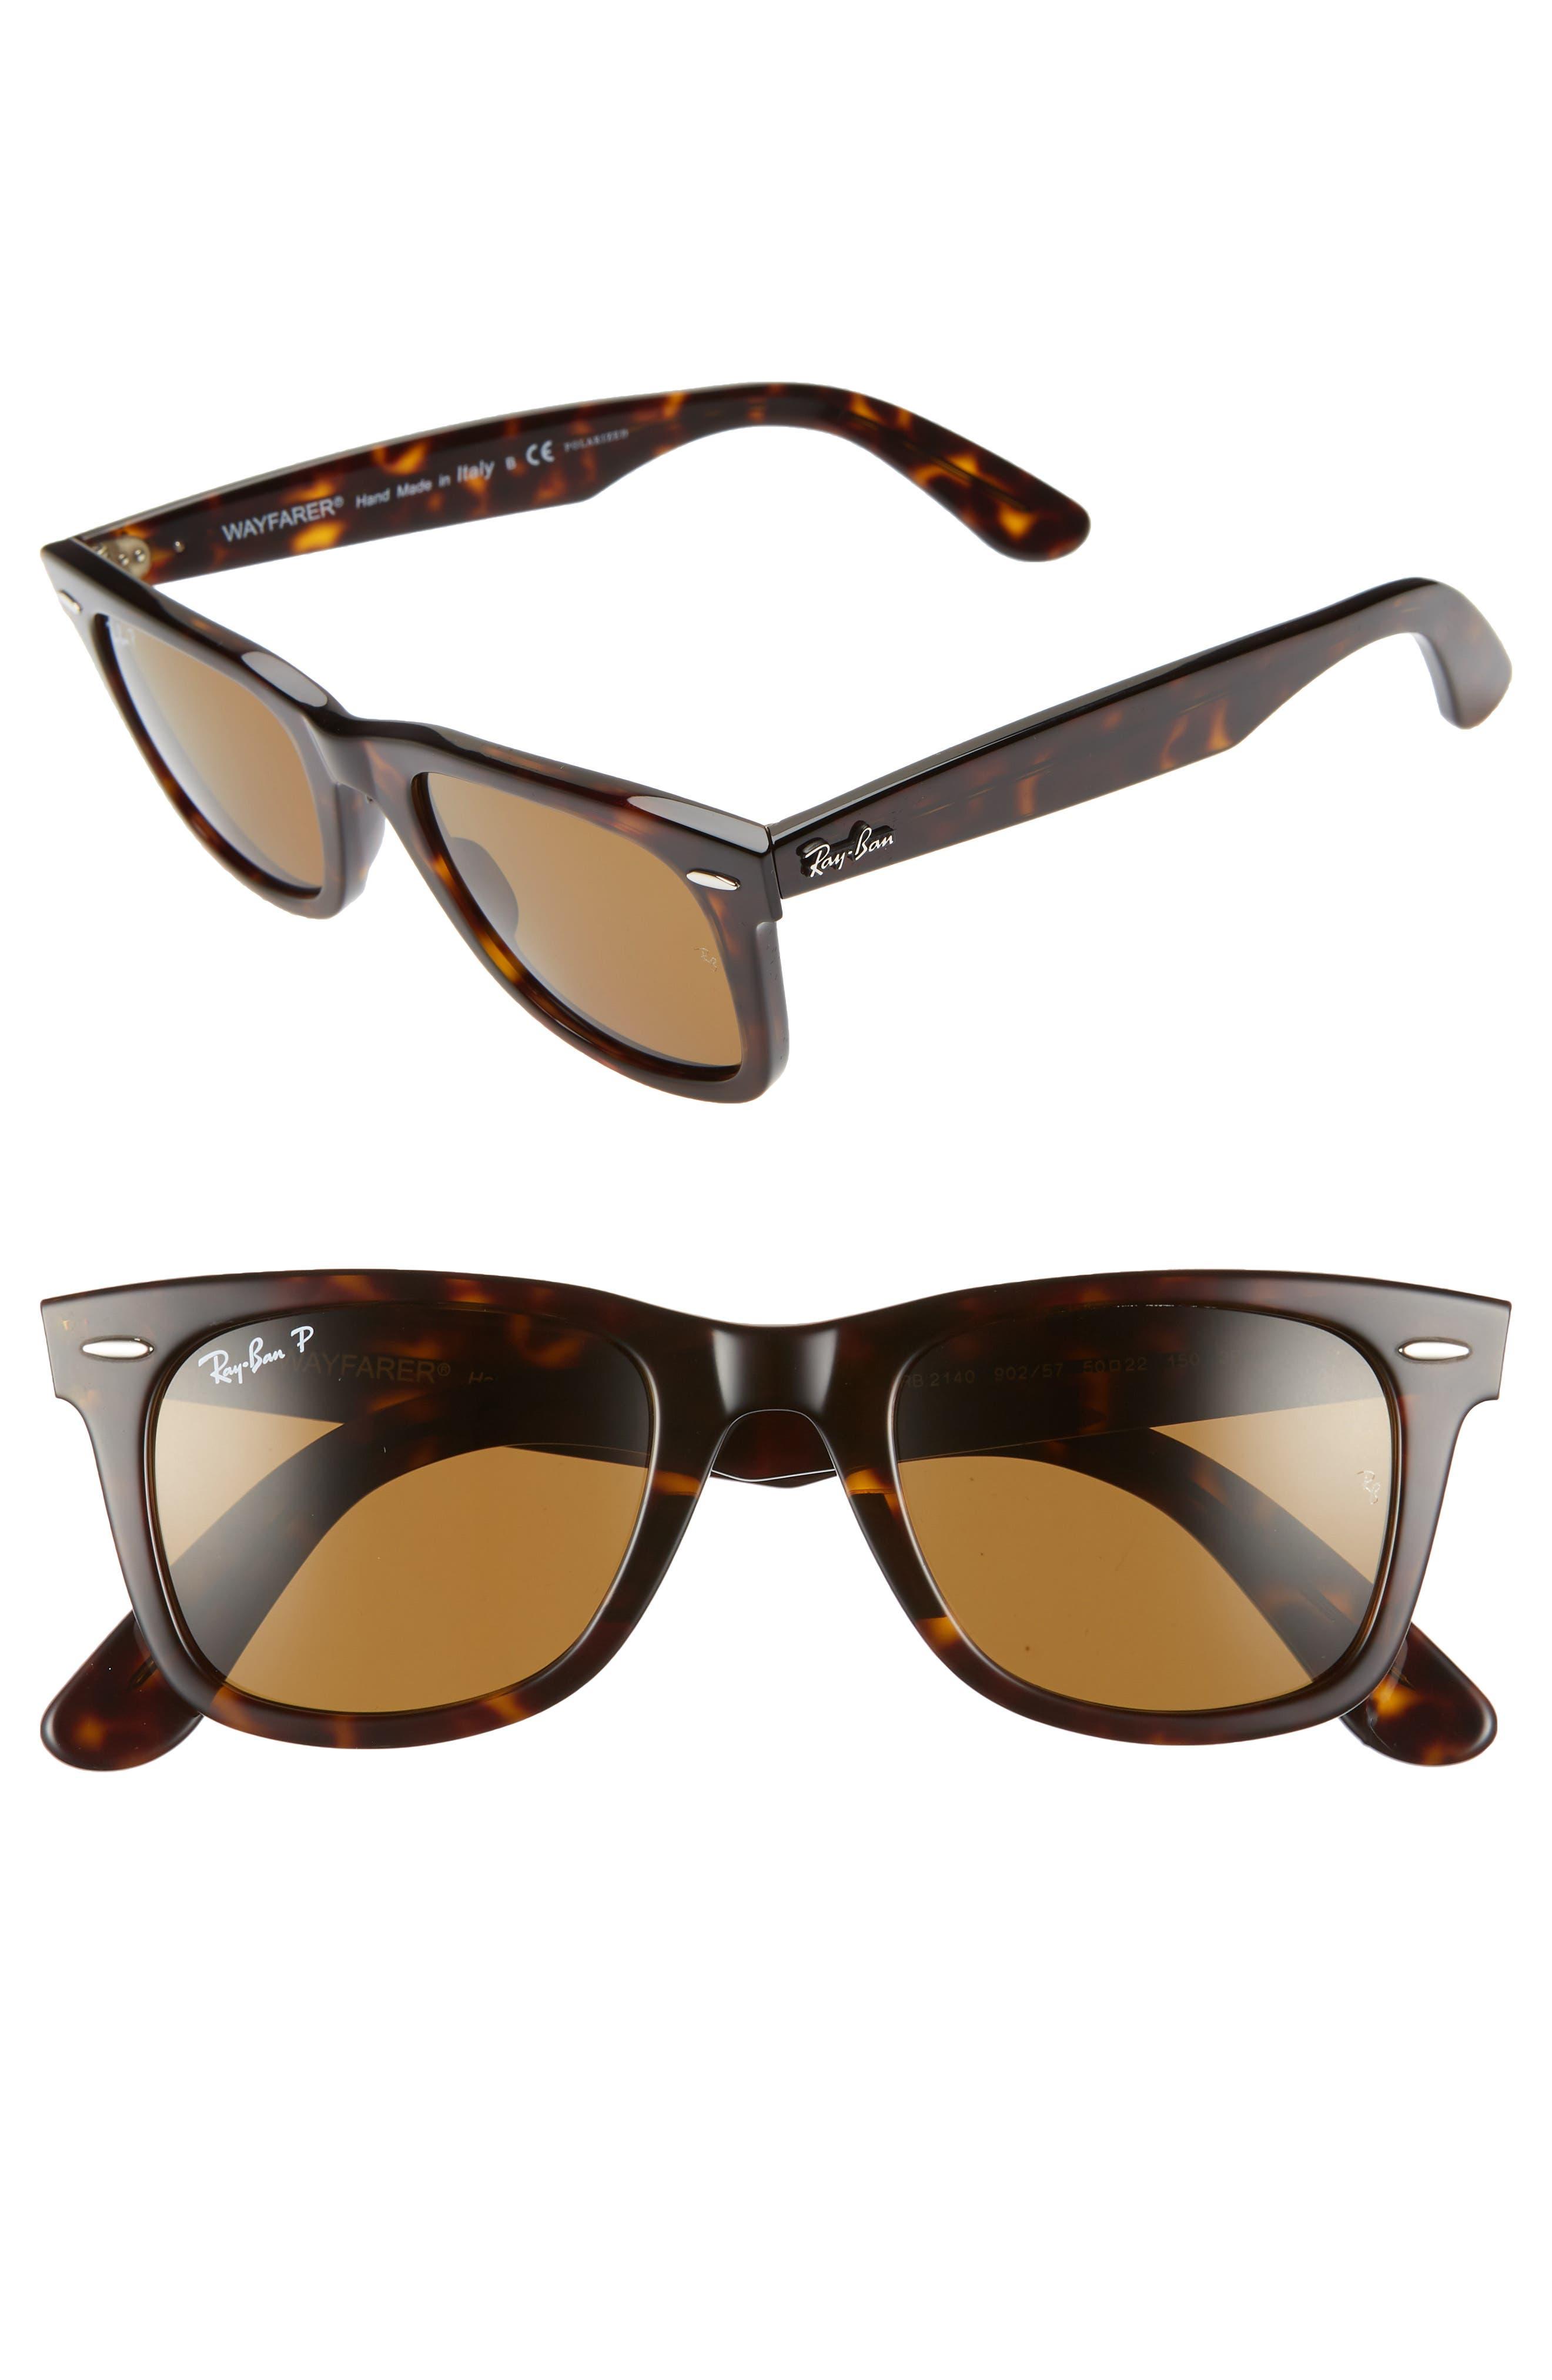 Standard Classic Wayfarer 50mm Polarized Sunglasses,                         Main,                         color, 205